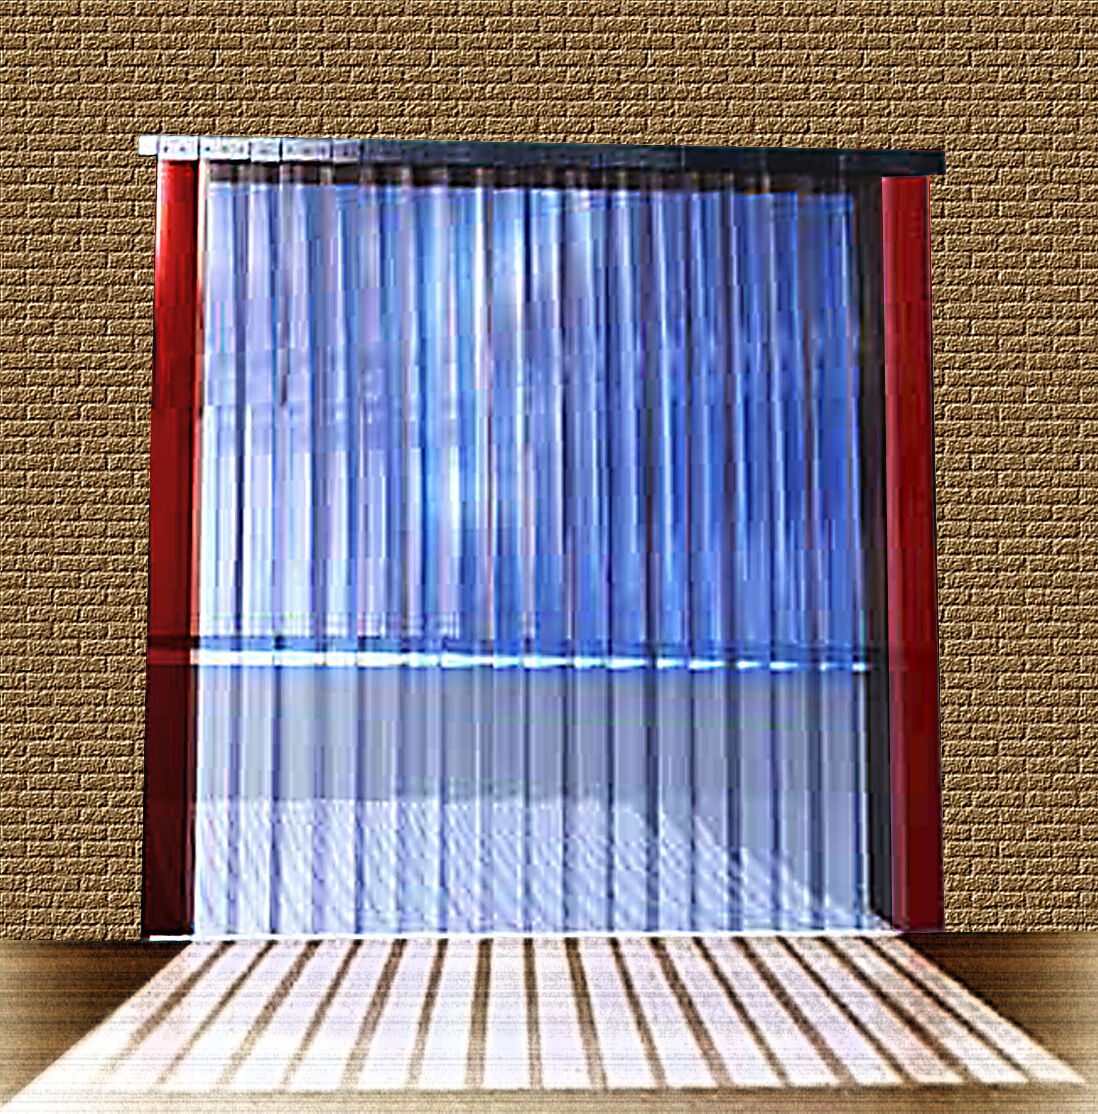 B 3,50m x H2,75m Lamellen PVC Streifen Vorhang 300x3mm